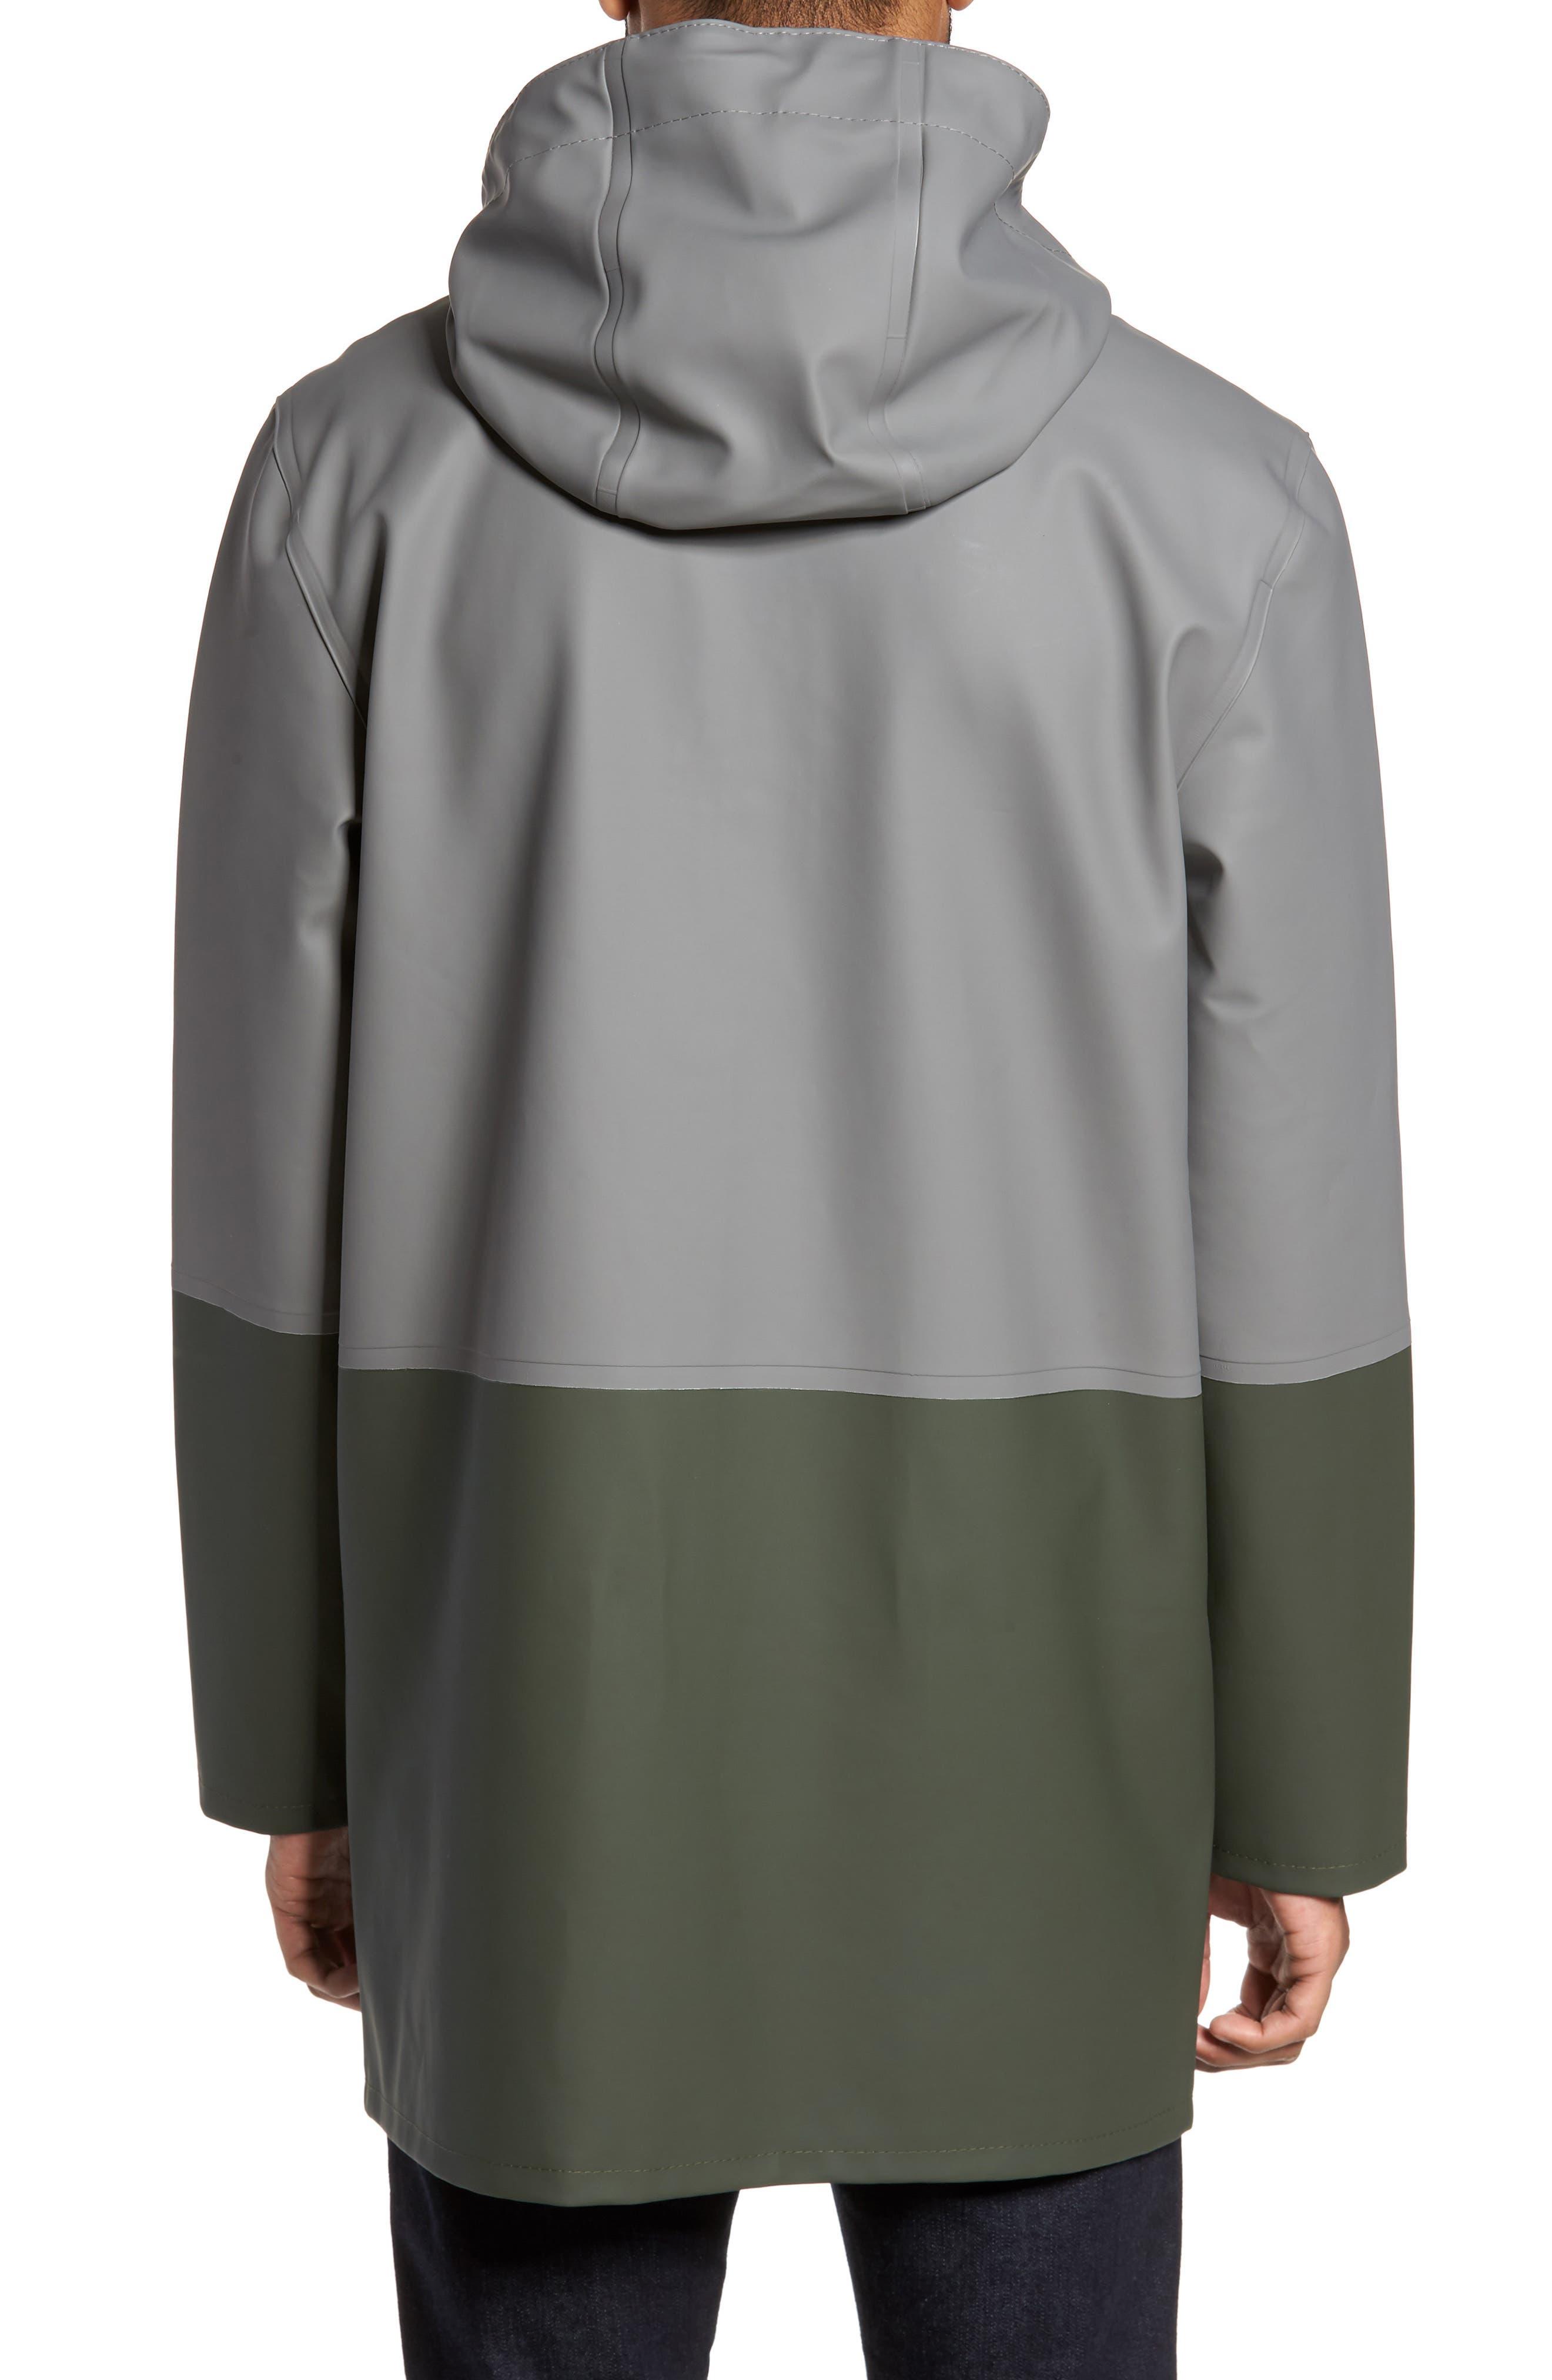 Stockholm Colorblock Waterproof Hooded Raincoat,                             Alternate thumbnail 2, color,                             Grey/ Green